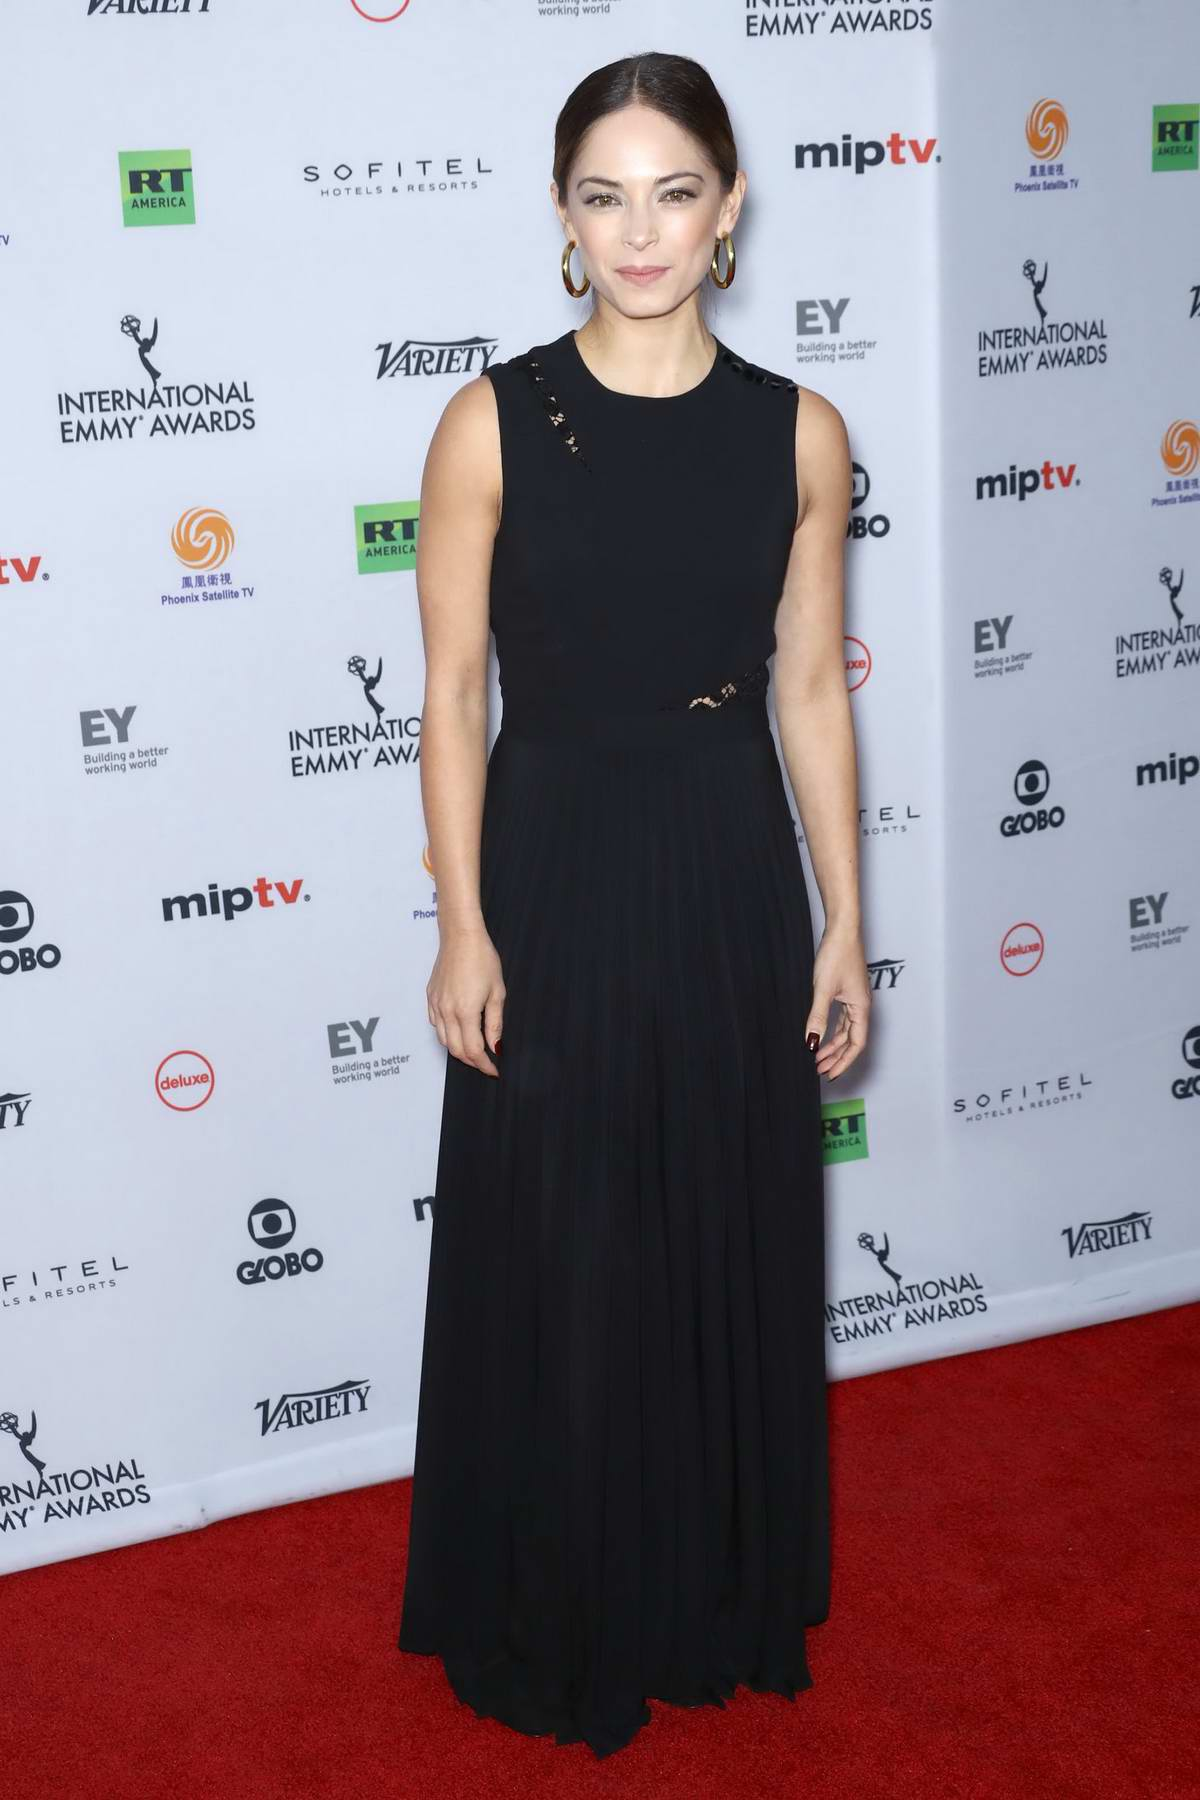 Kristin Kreuk at the International Emmy Awards 2017 in New York